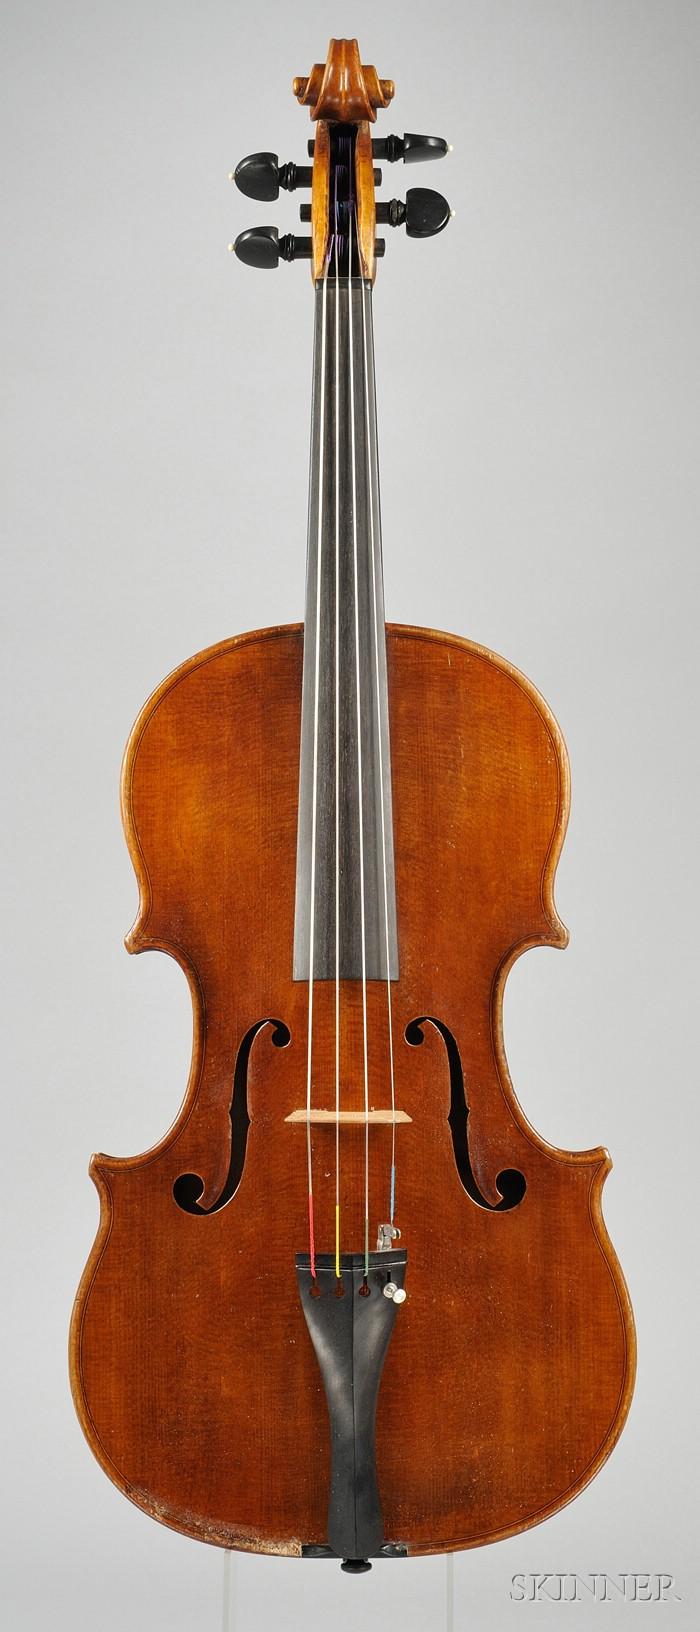 Modern Italian Viola, Probably Sderci Workshop